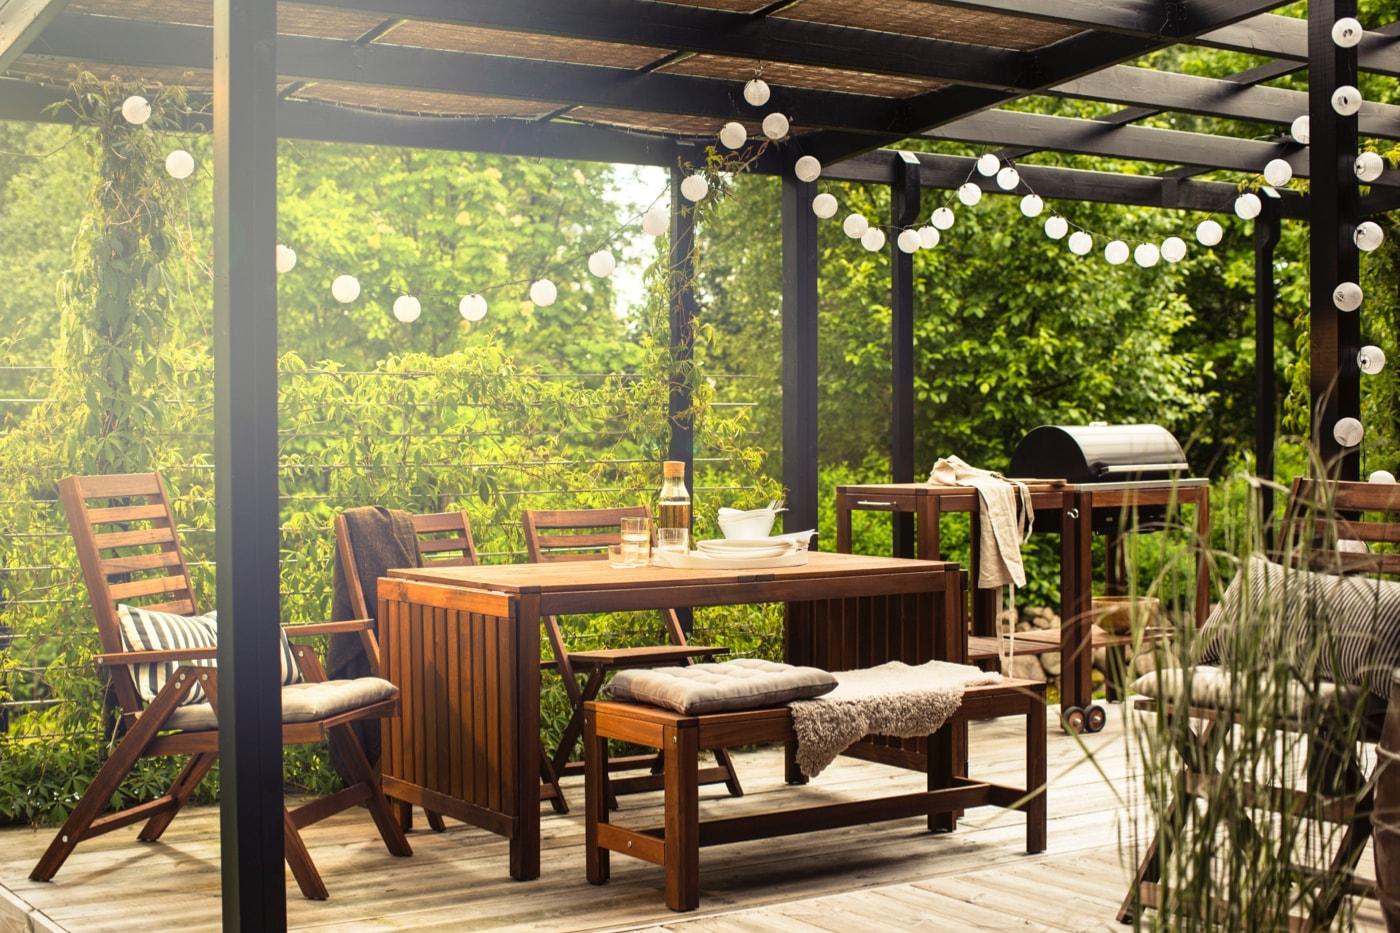 alle serien systeme f r garten balkon ikea. Black Bedroom Furniture Sets. Home Design Ideas